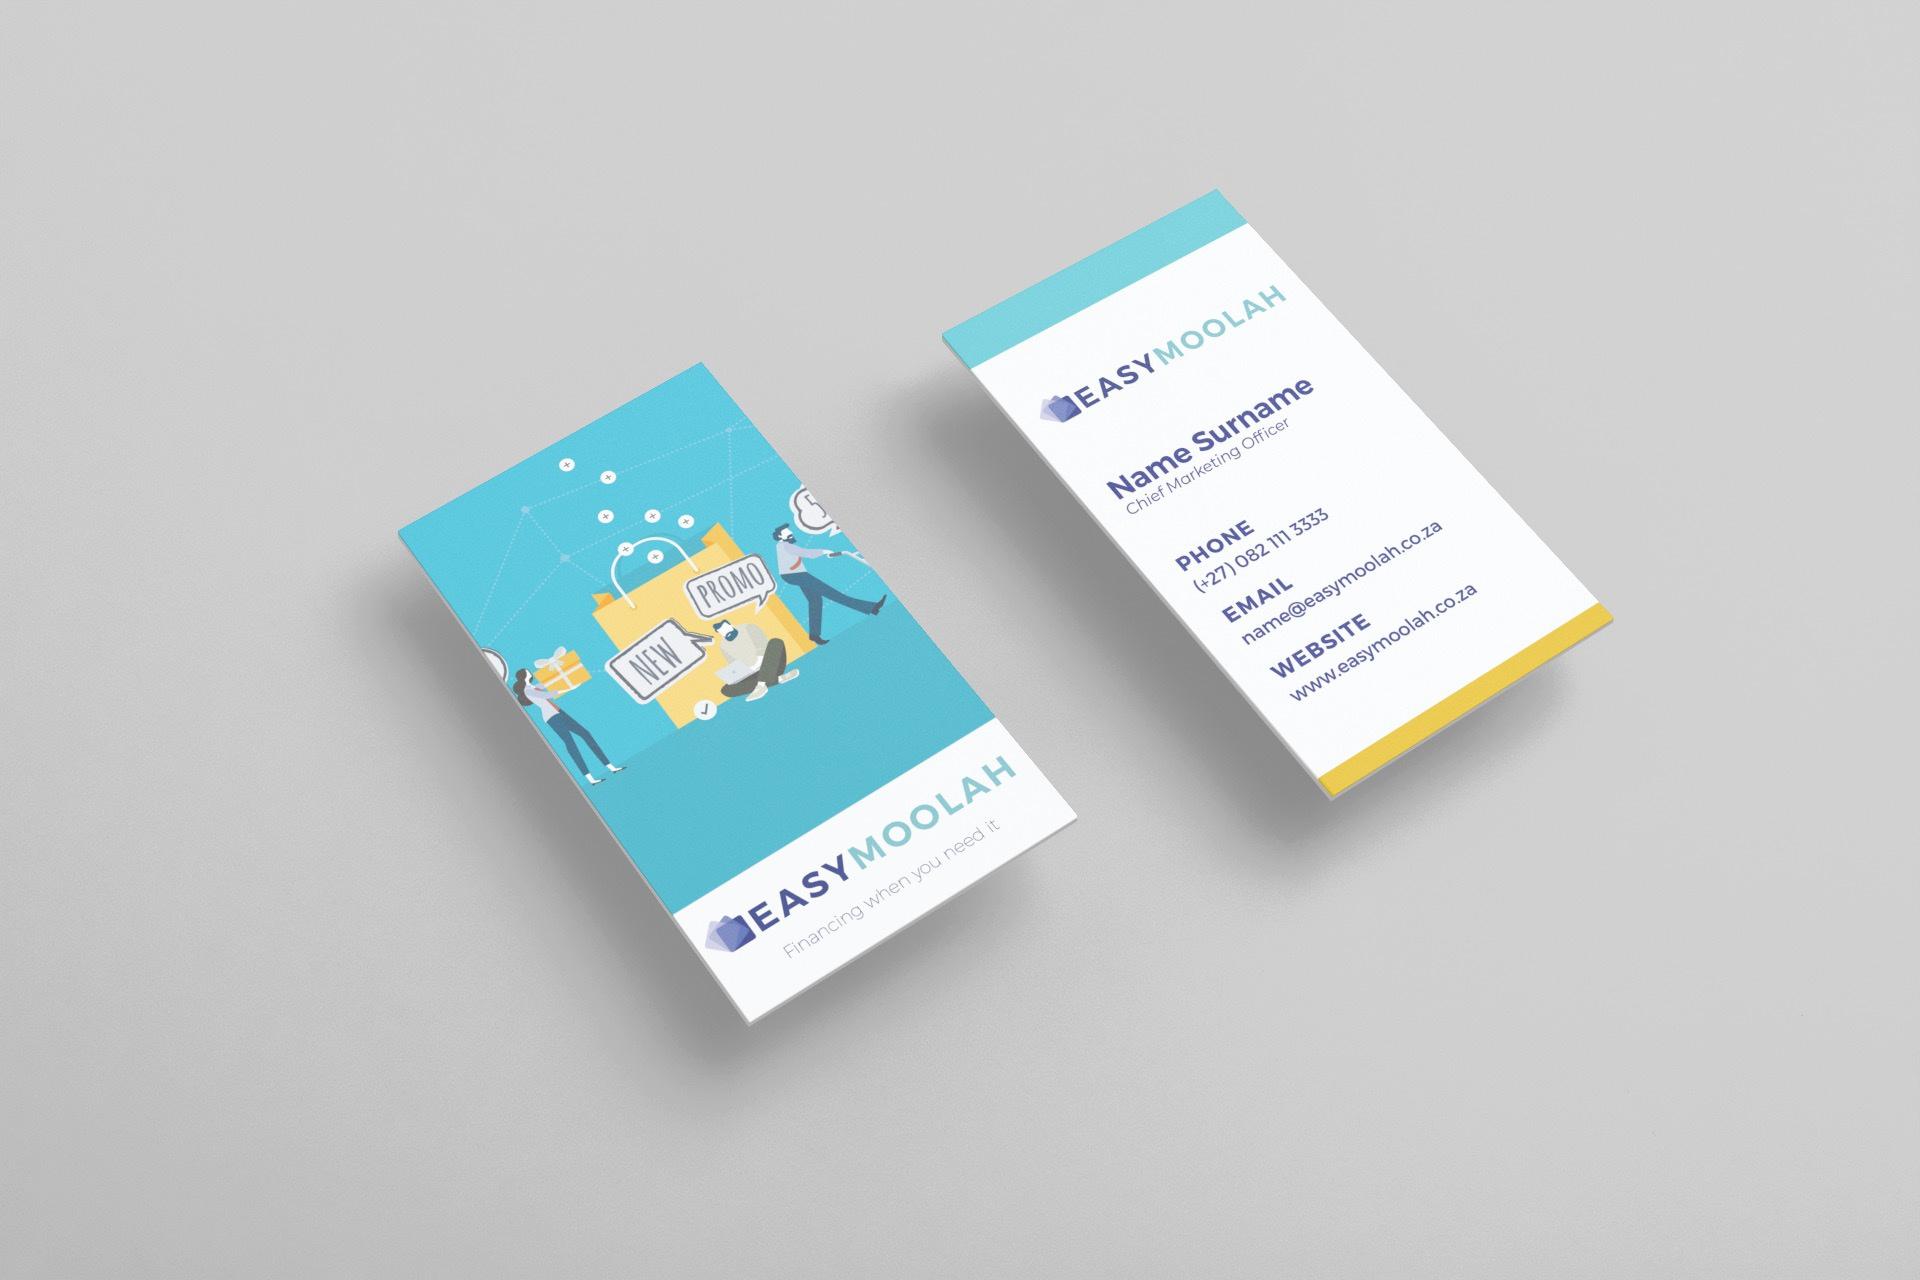 EasyMoolah Business Card Design | KEMOSO